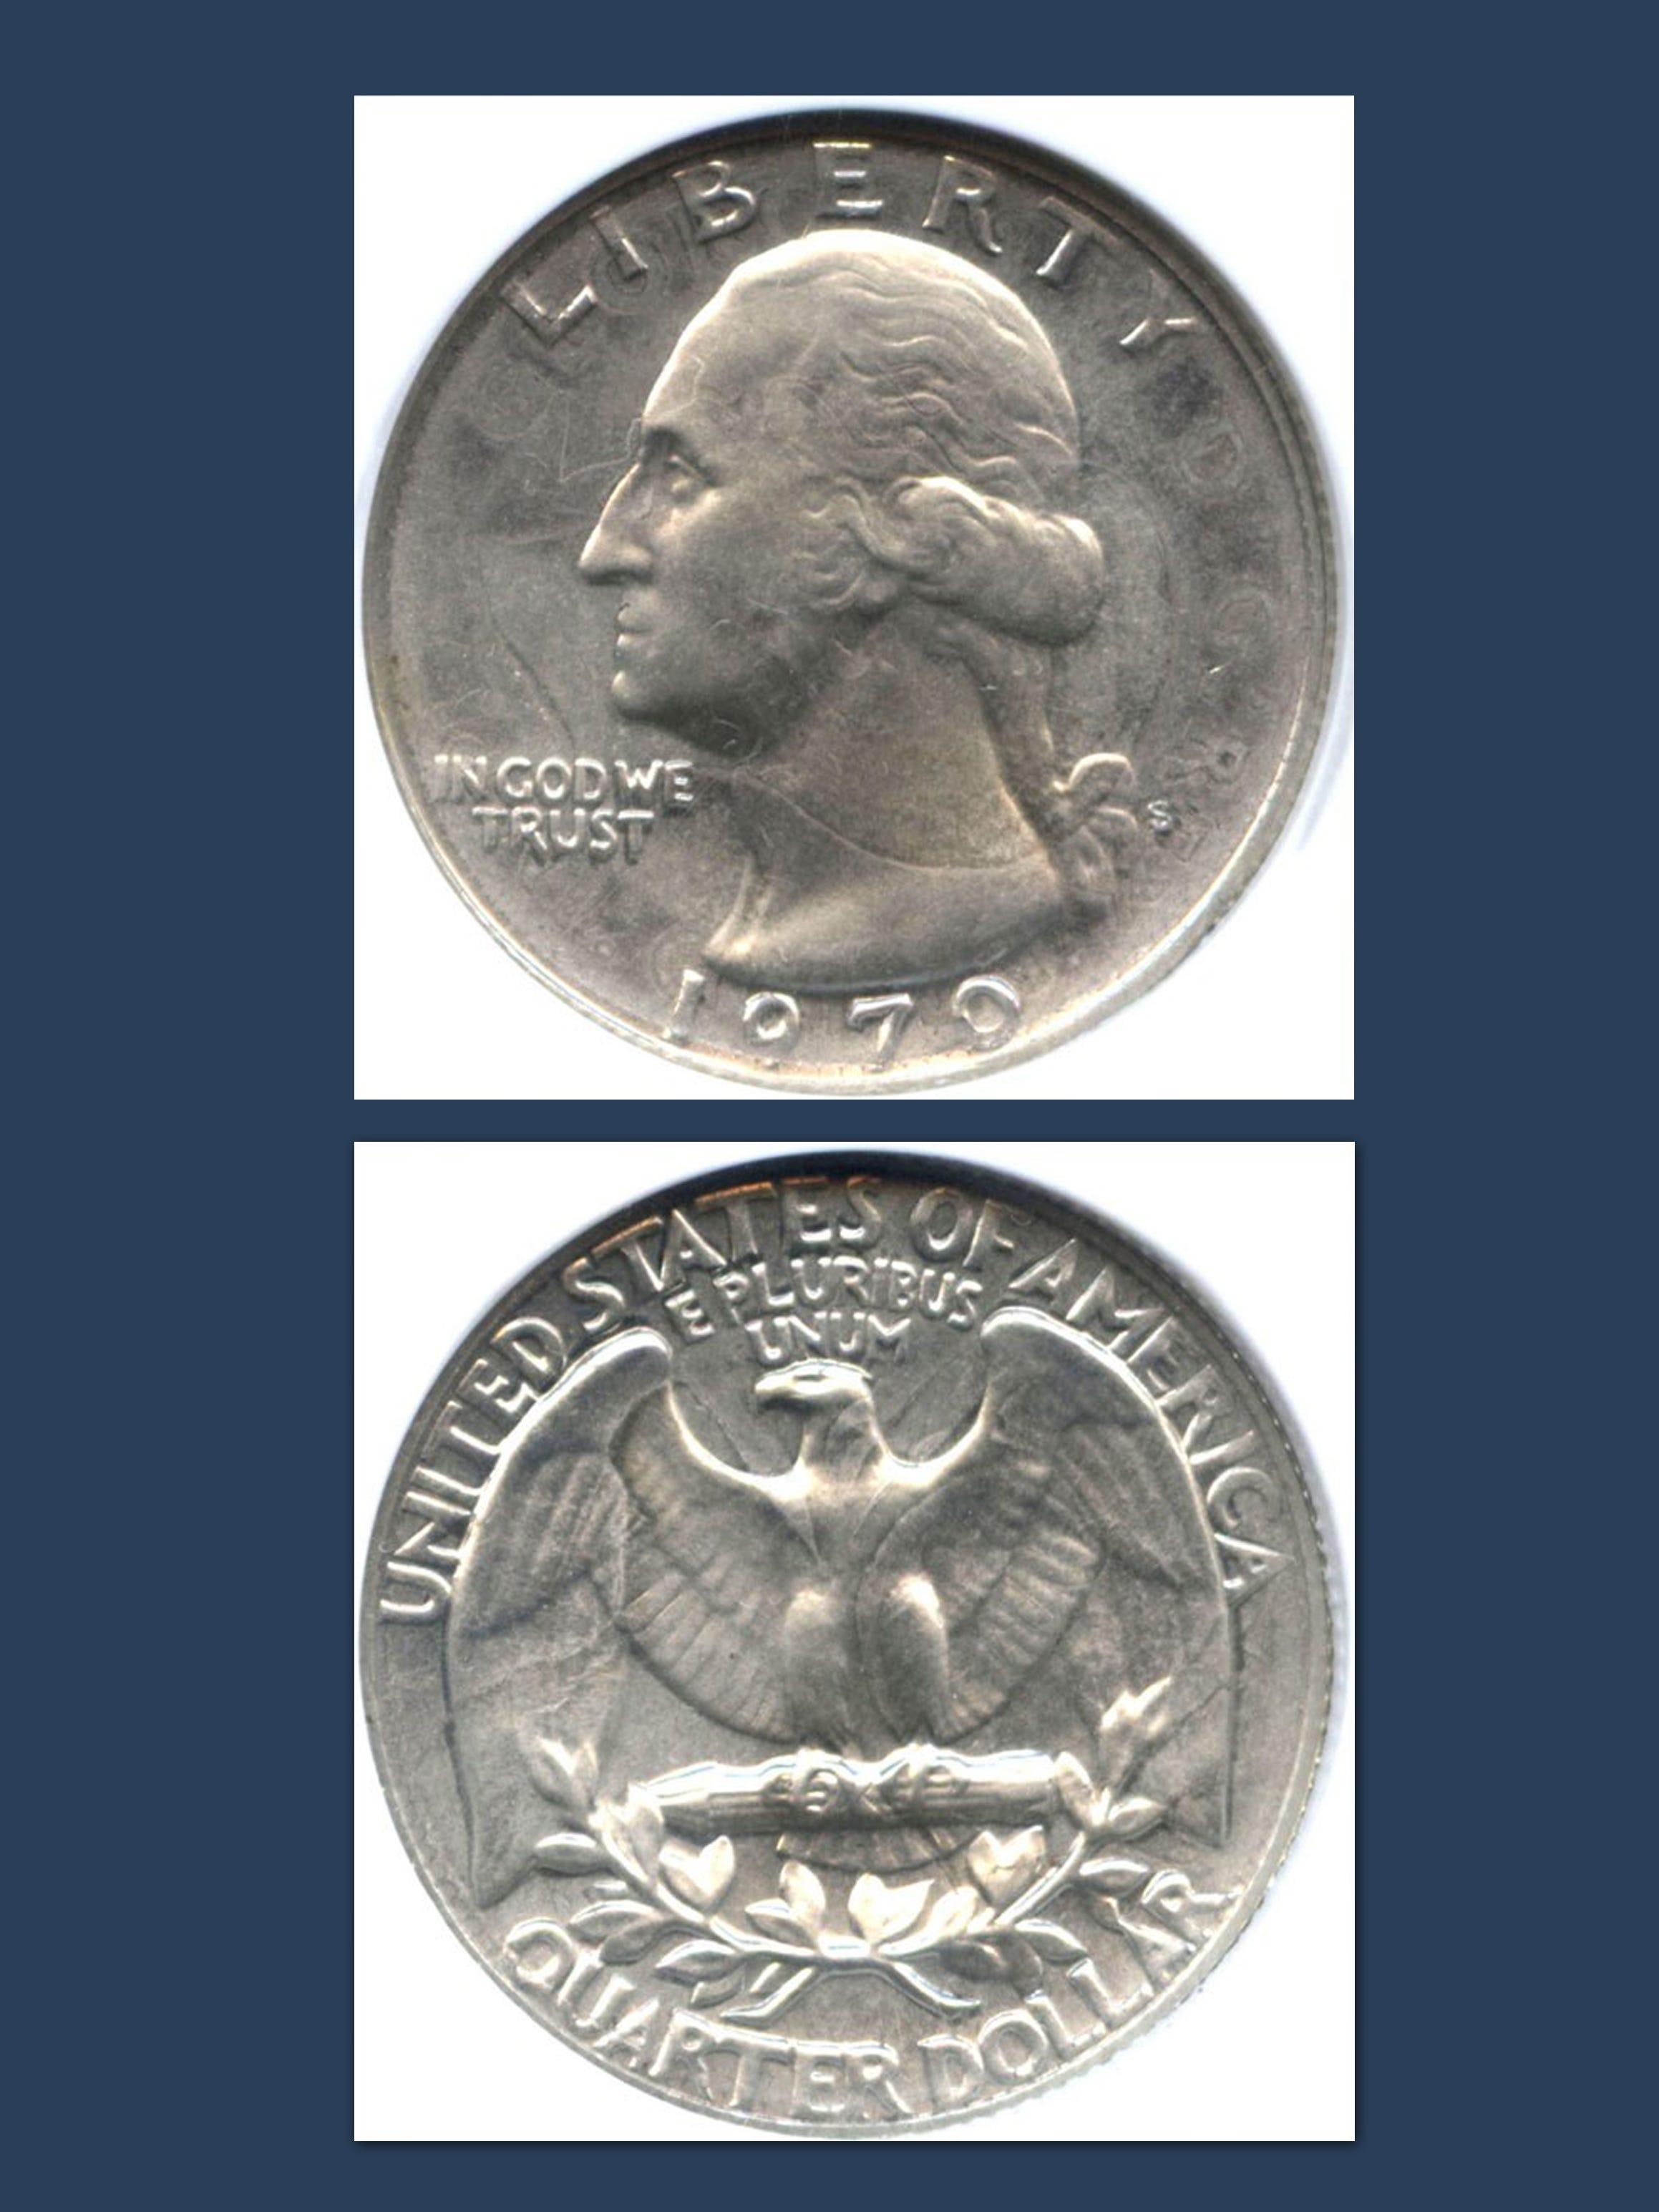 CANADA 1970 Circulated Hard to Find 25¢ Quarter